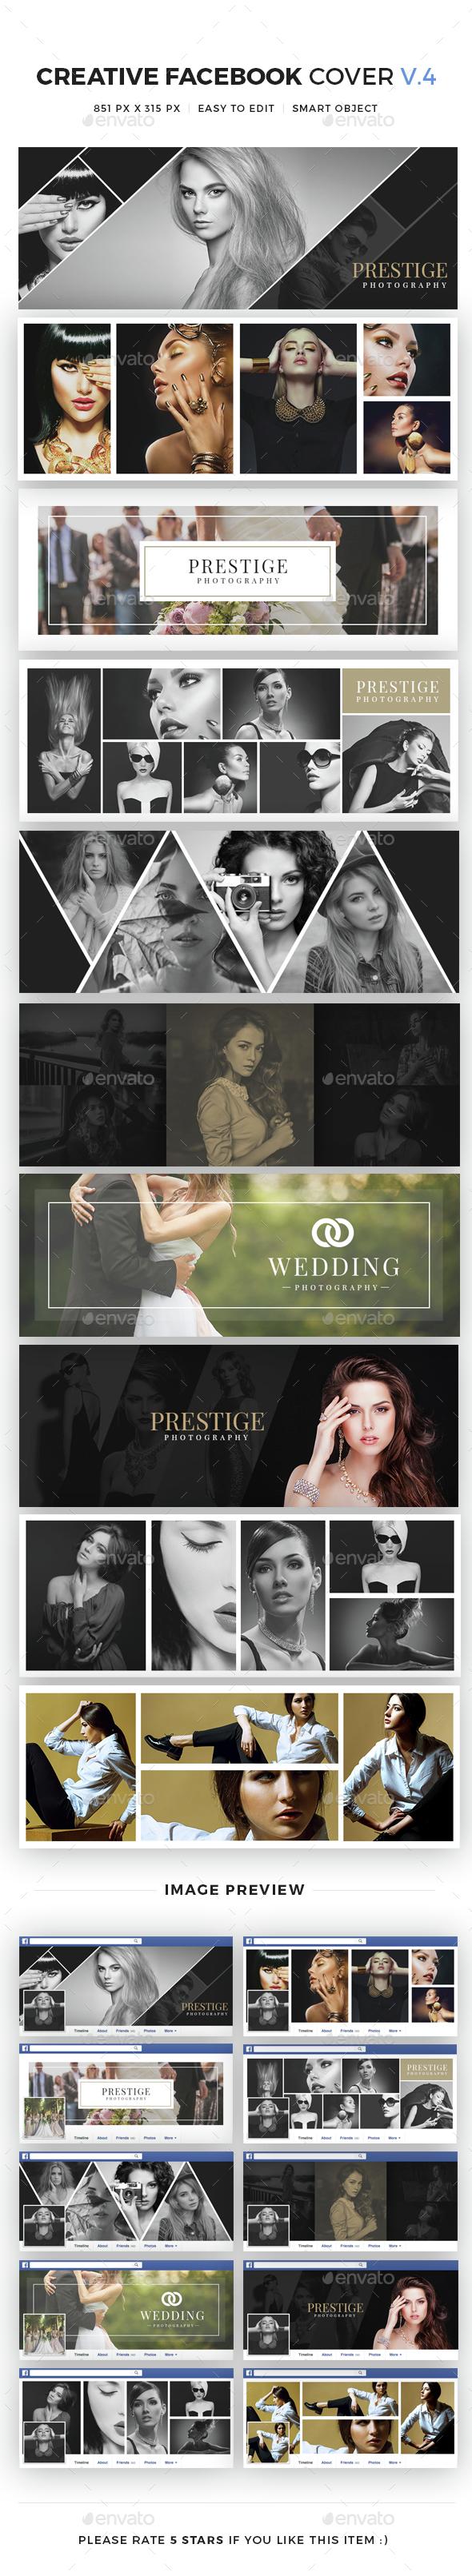 10 Creative Facebook Cover V4 - Facebook Timeline Covers Social Media